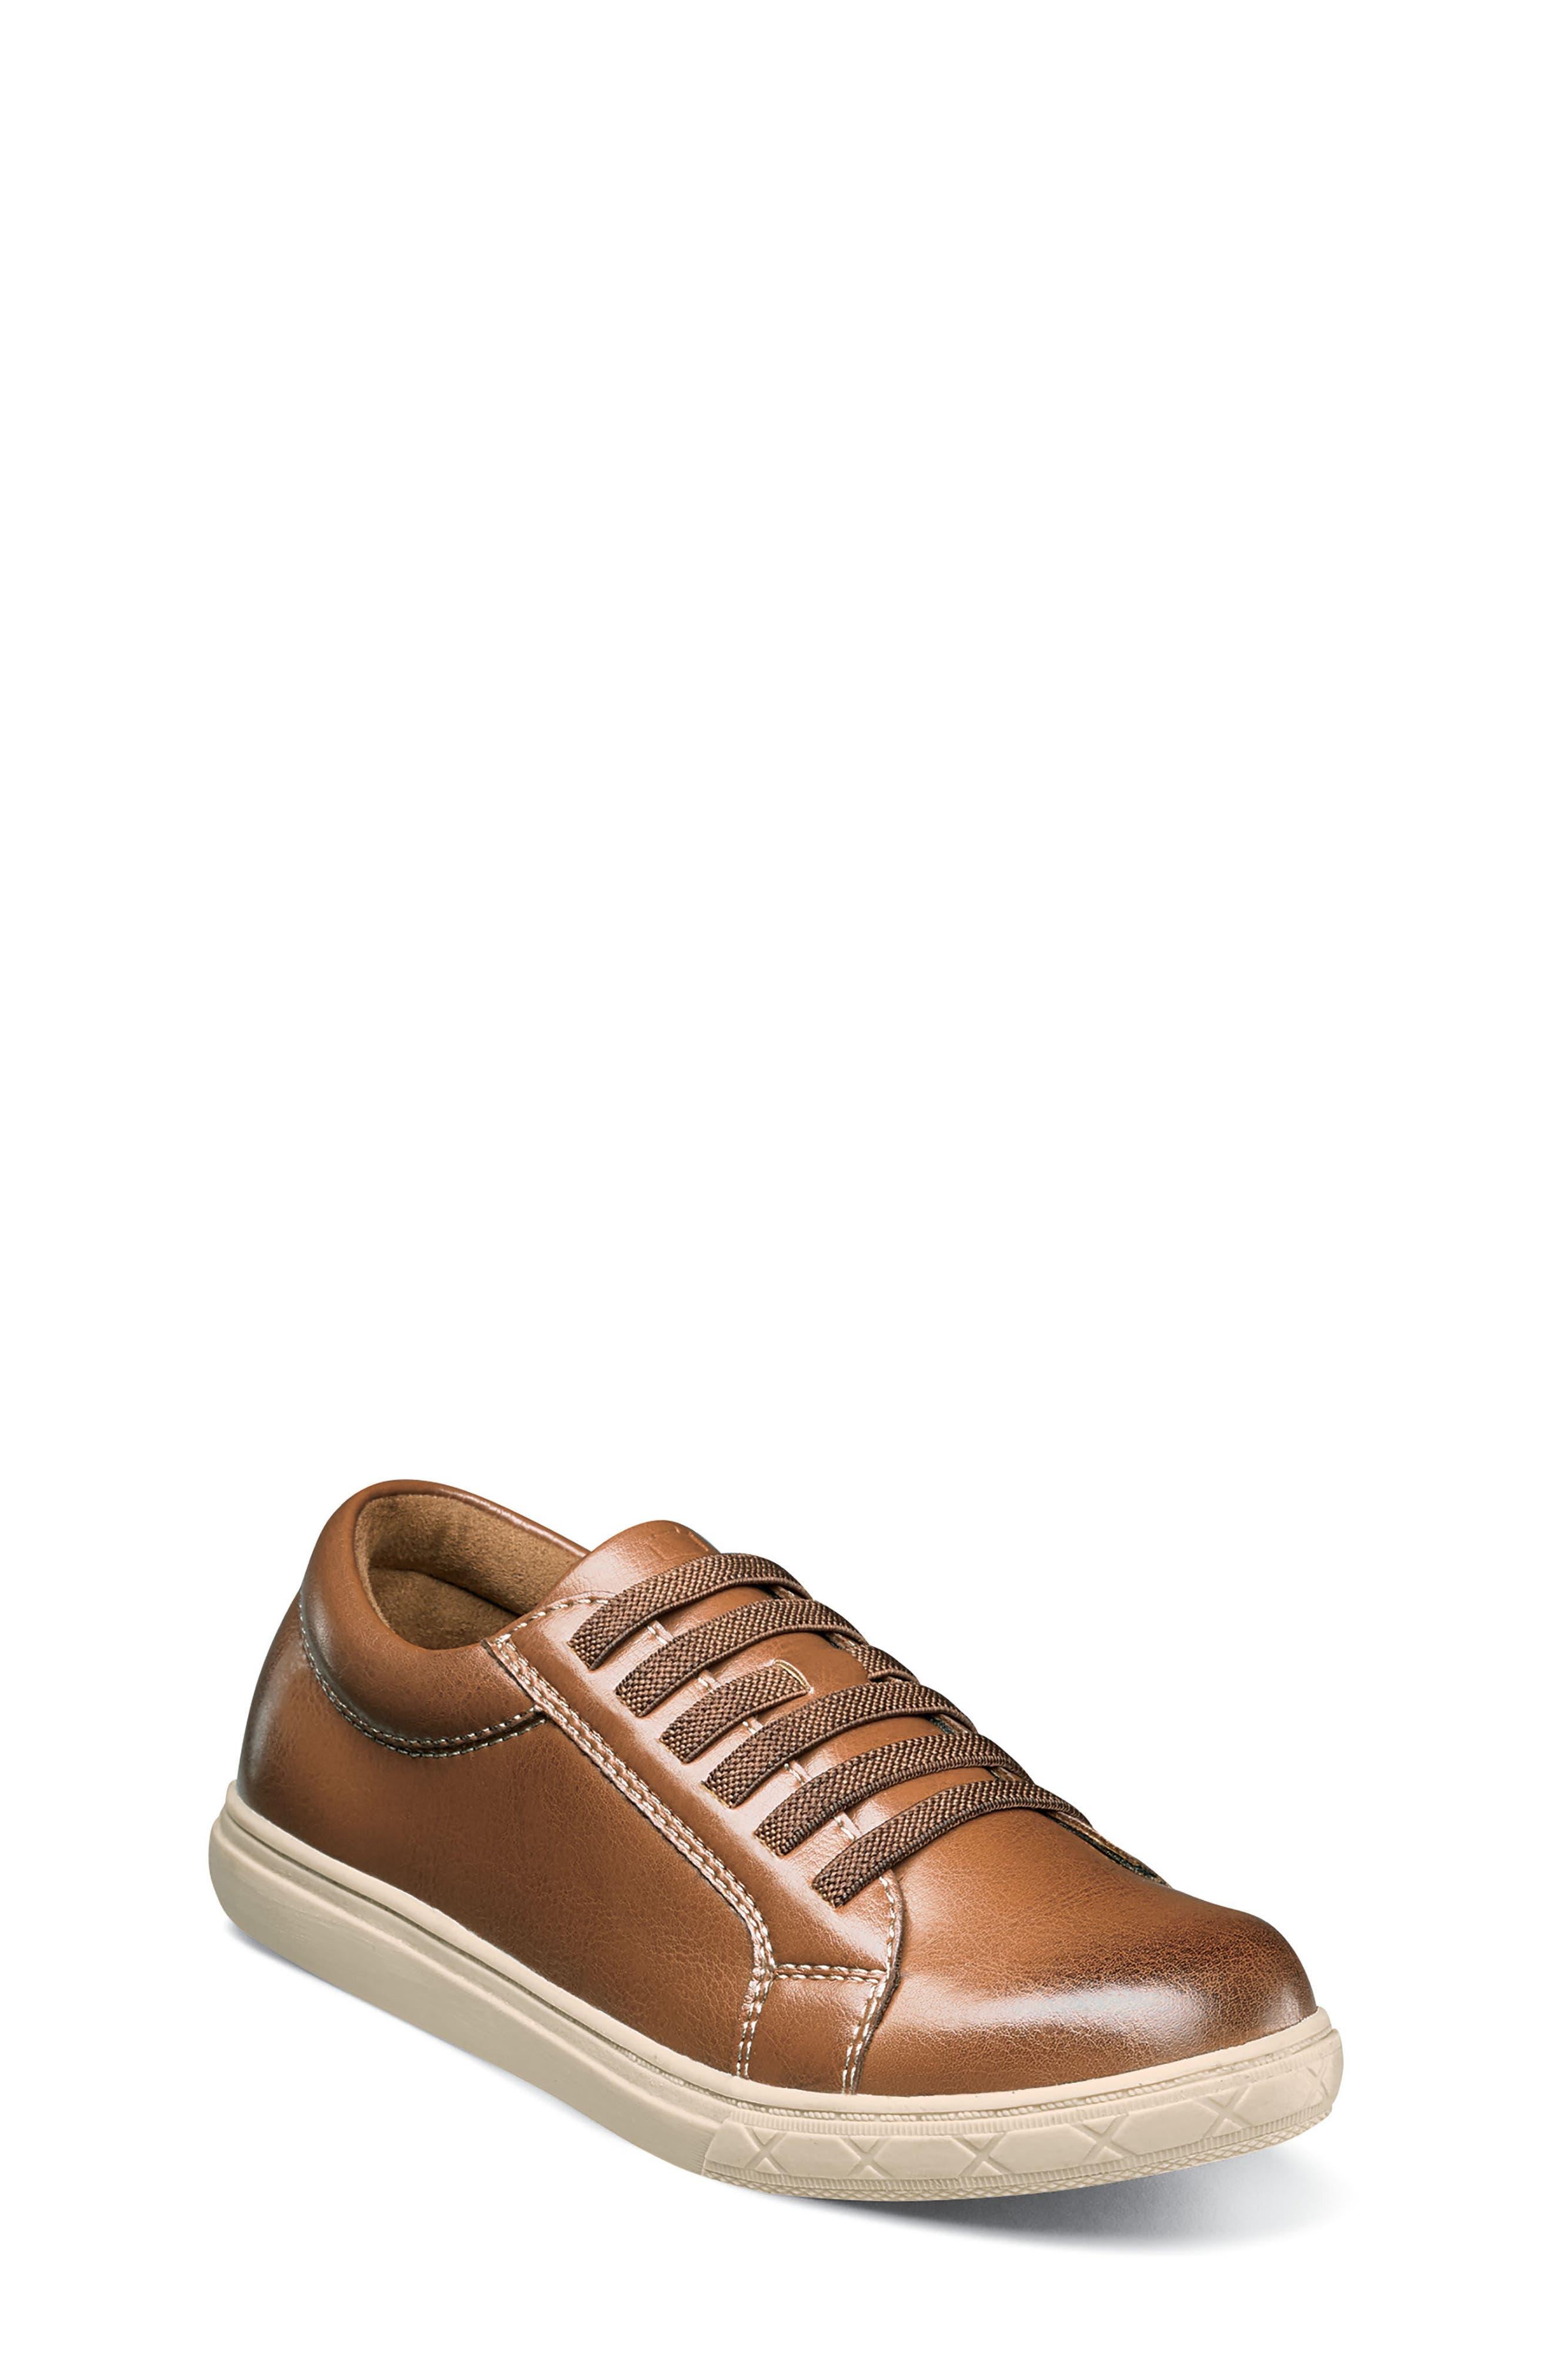 Curb Elastic Lace Sneaker,                             Main thumbnail 1, color,                             Cognac